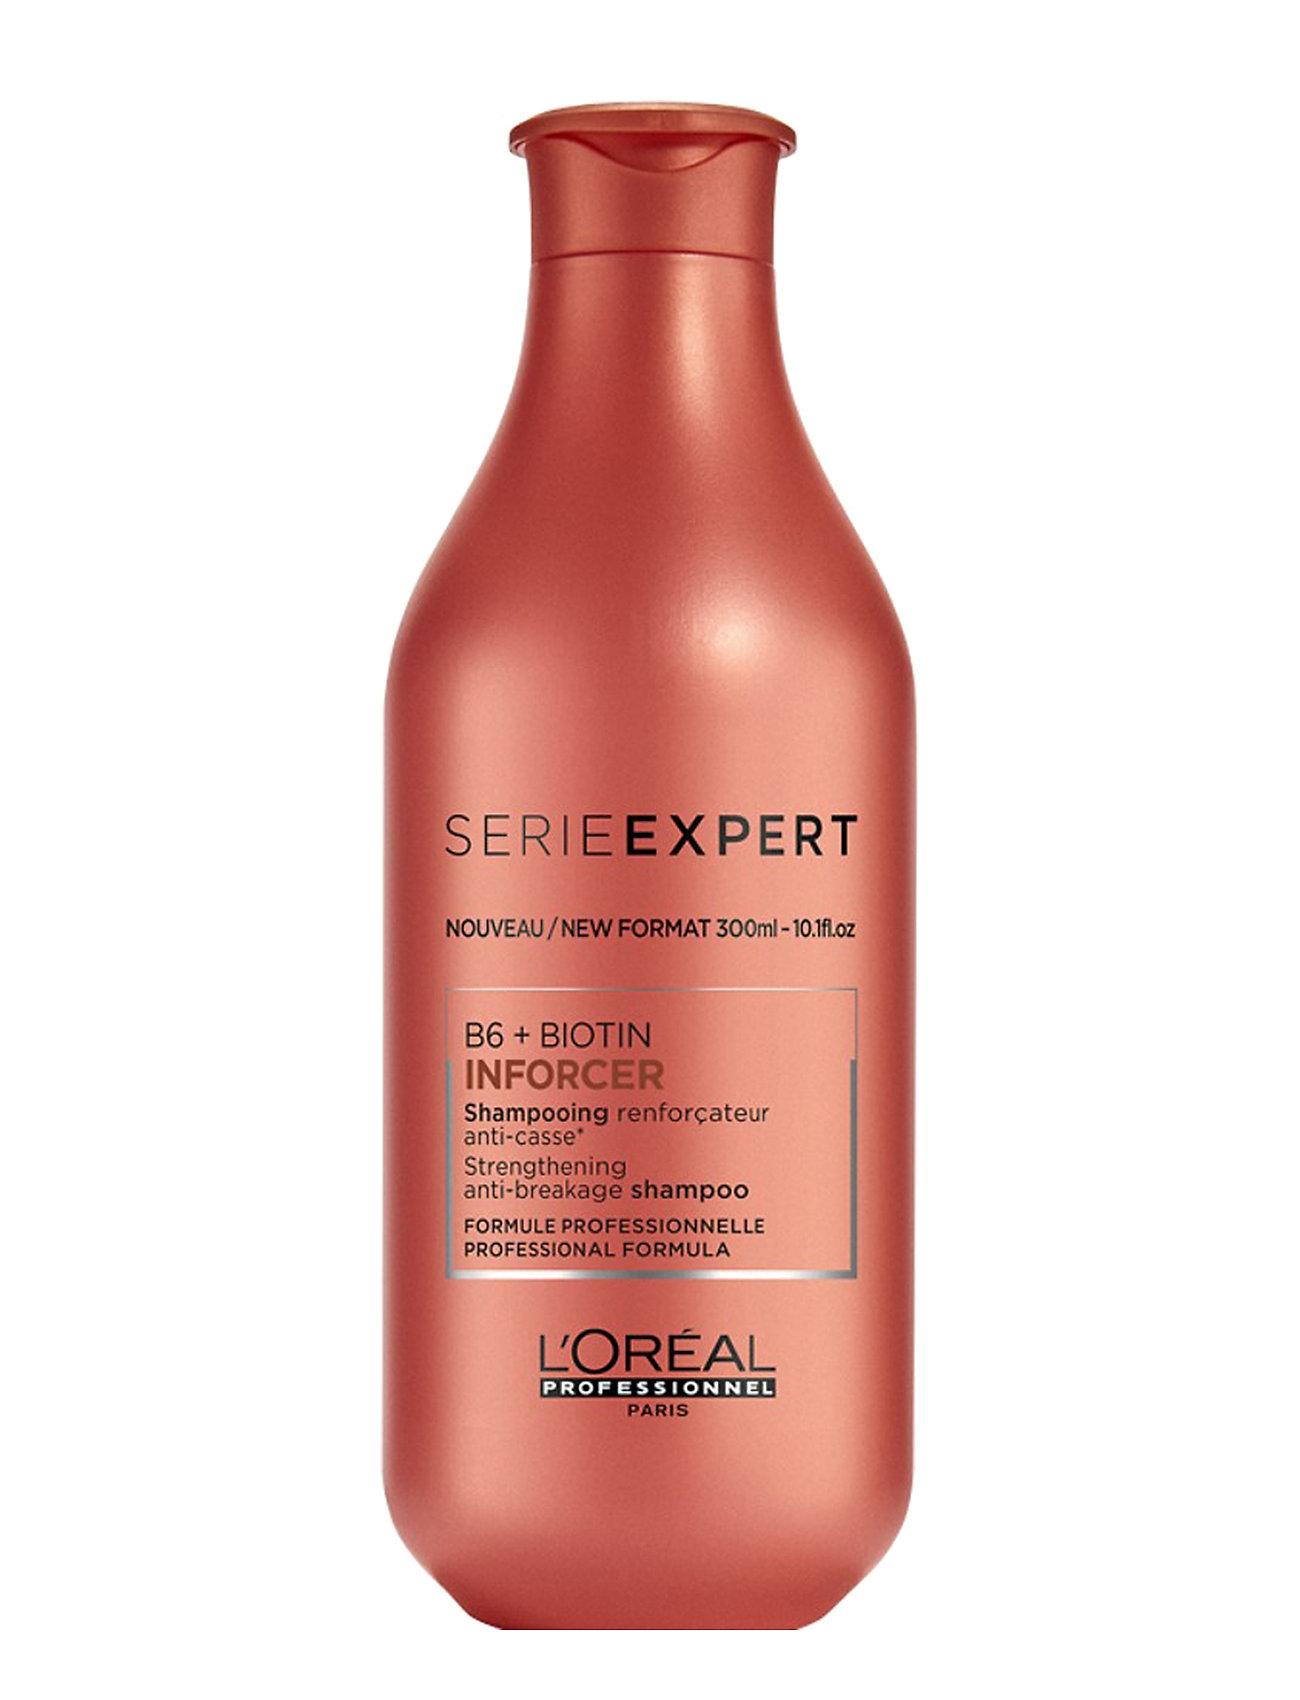 L'Oréal Professionnel L'Oréal Professionnel Inforcer Shampoo - CLEAR